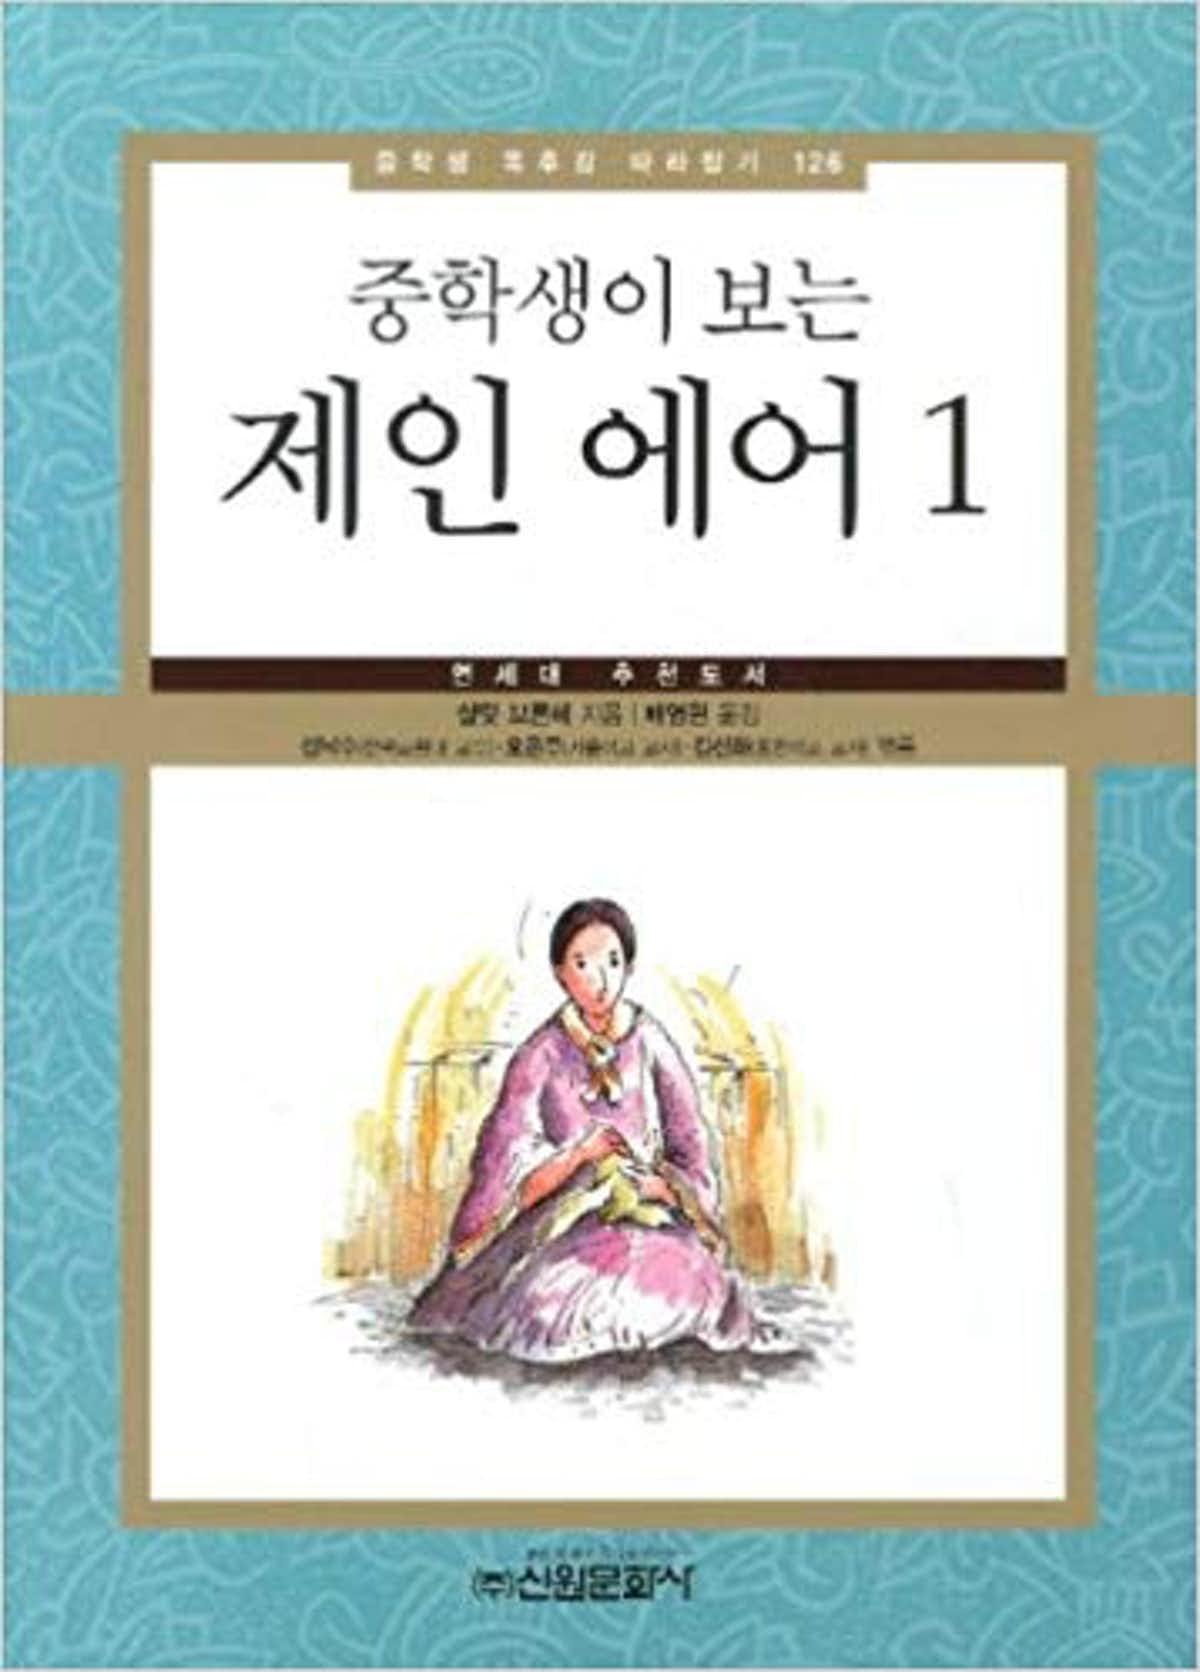 Jane Eyre (Korean edition)